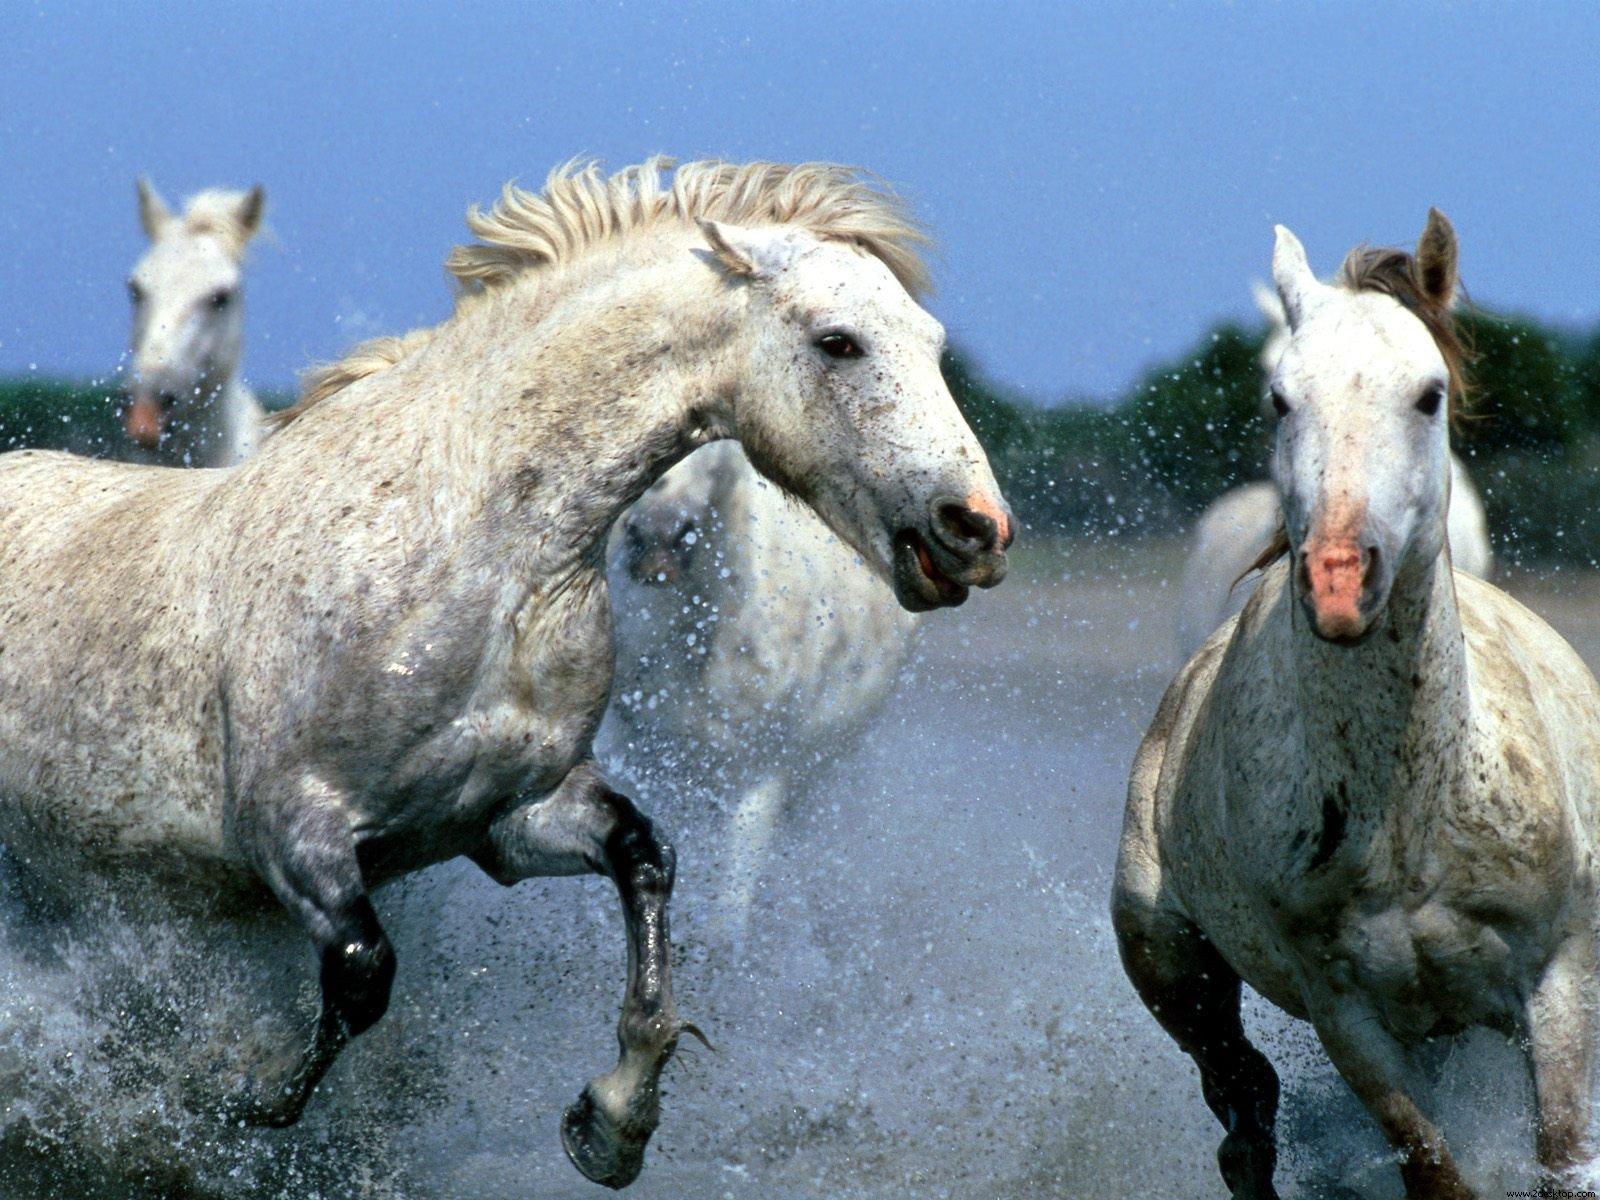 wild horses running wallpapers - photo #25